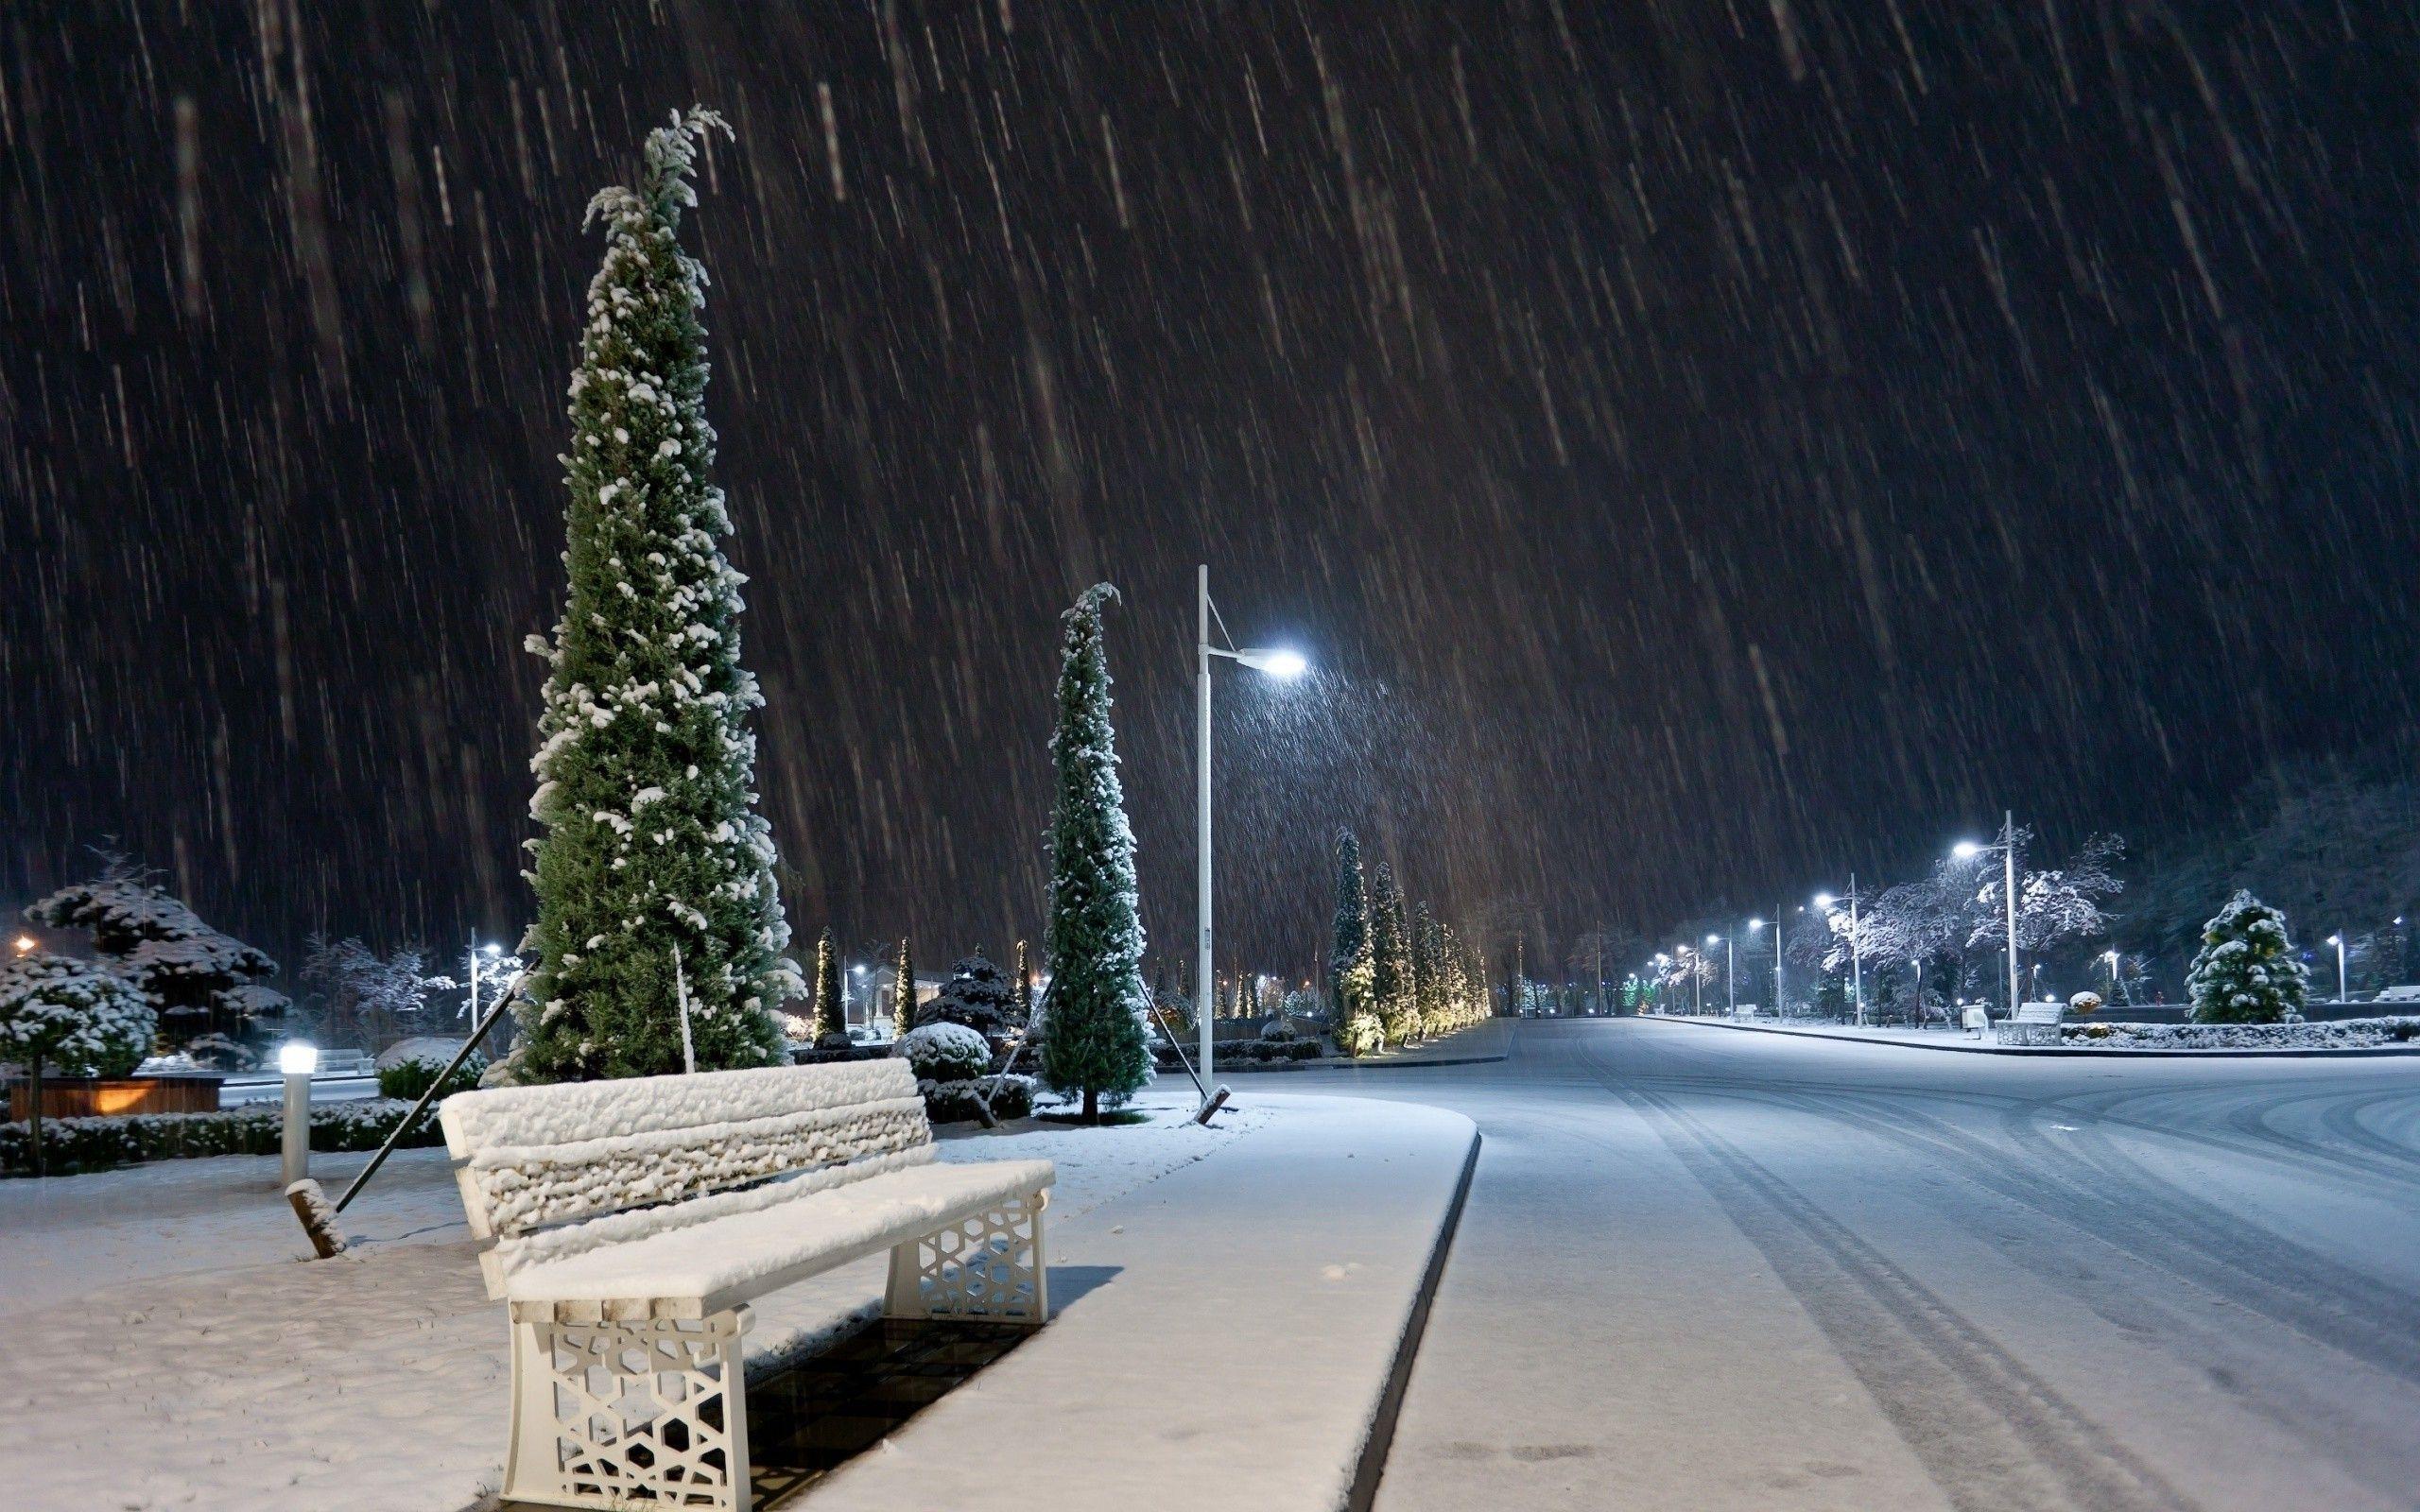 Snow Night On A City Street Snow Night Night City Winter Wallpaper